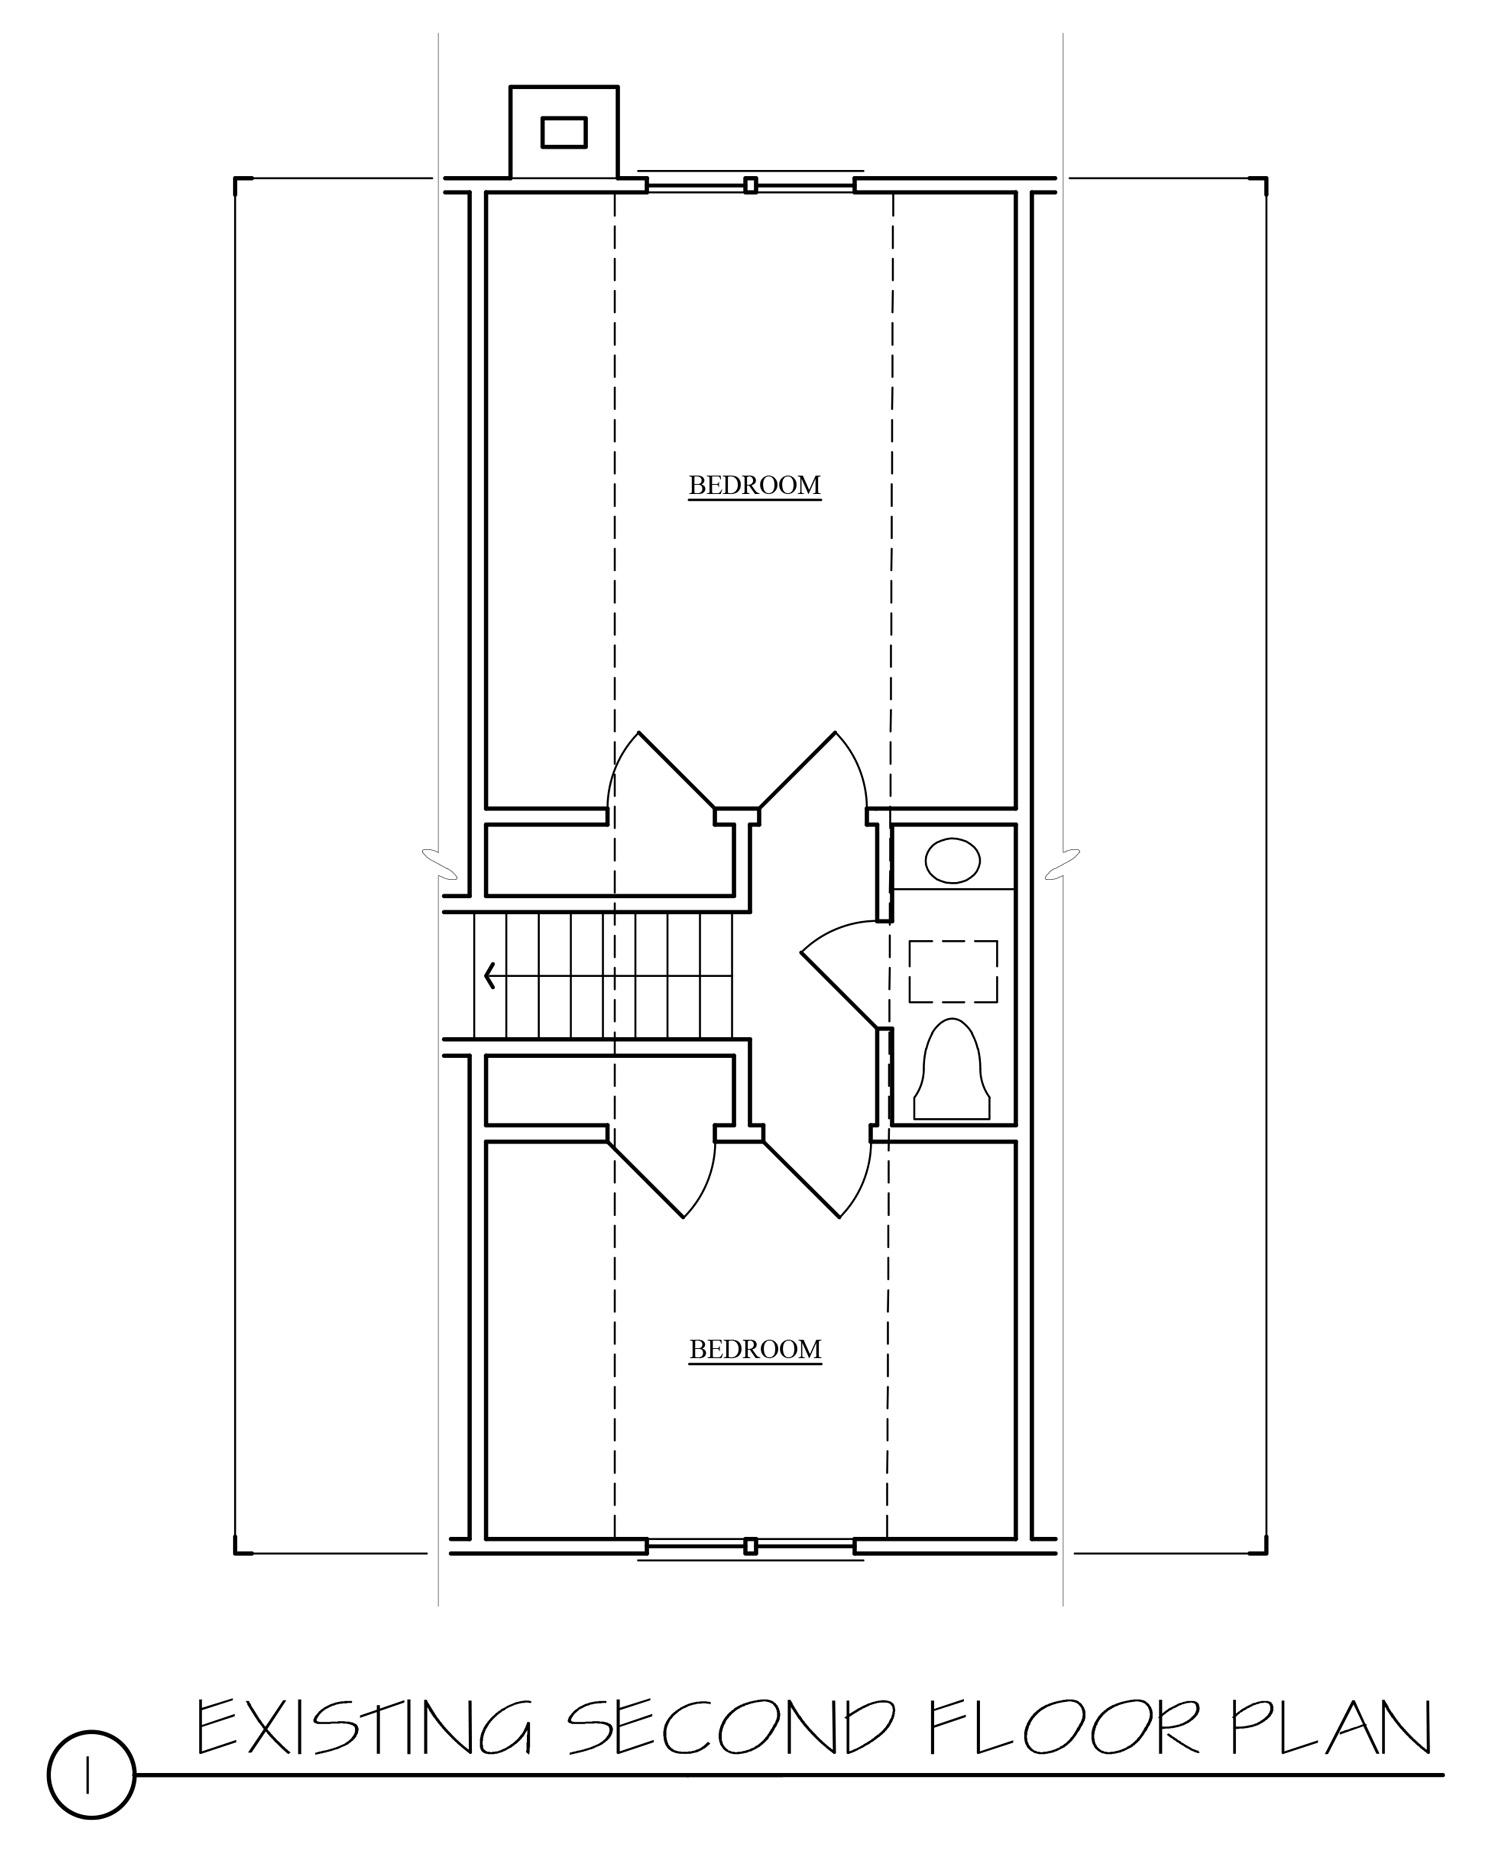 Existing-Second-Floor-Plan.jpg